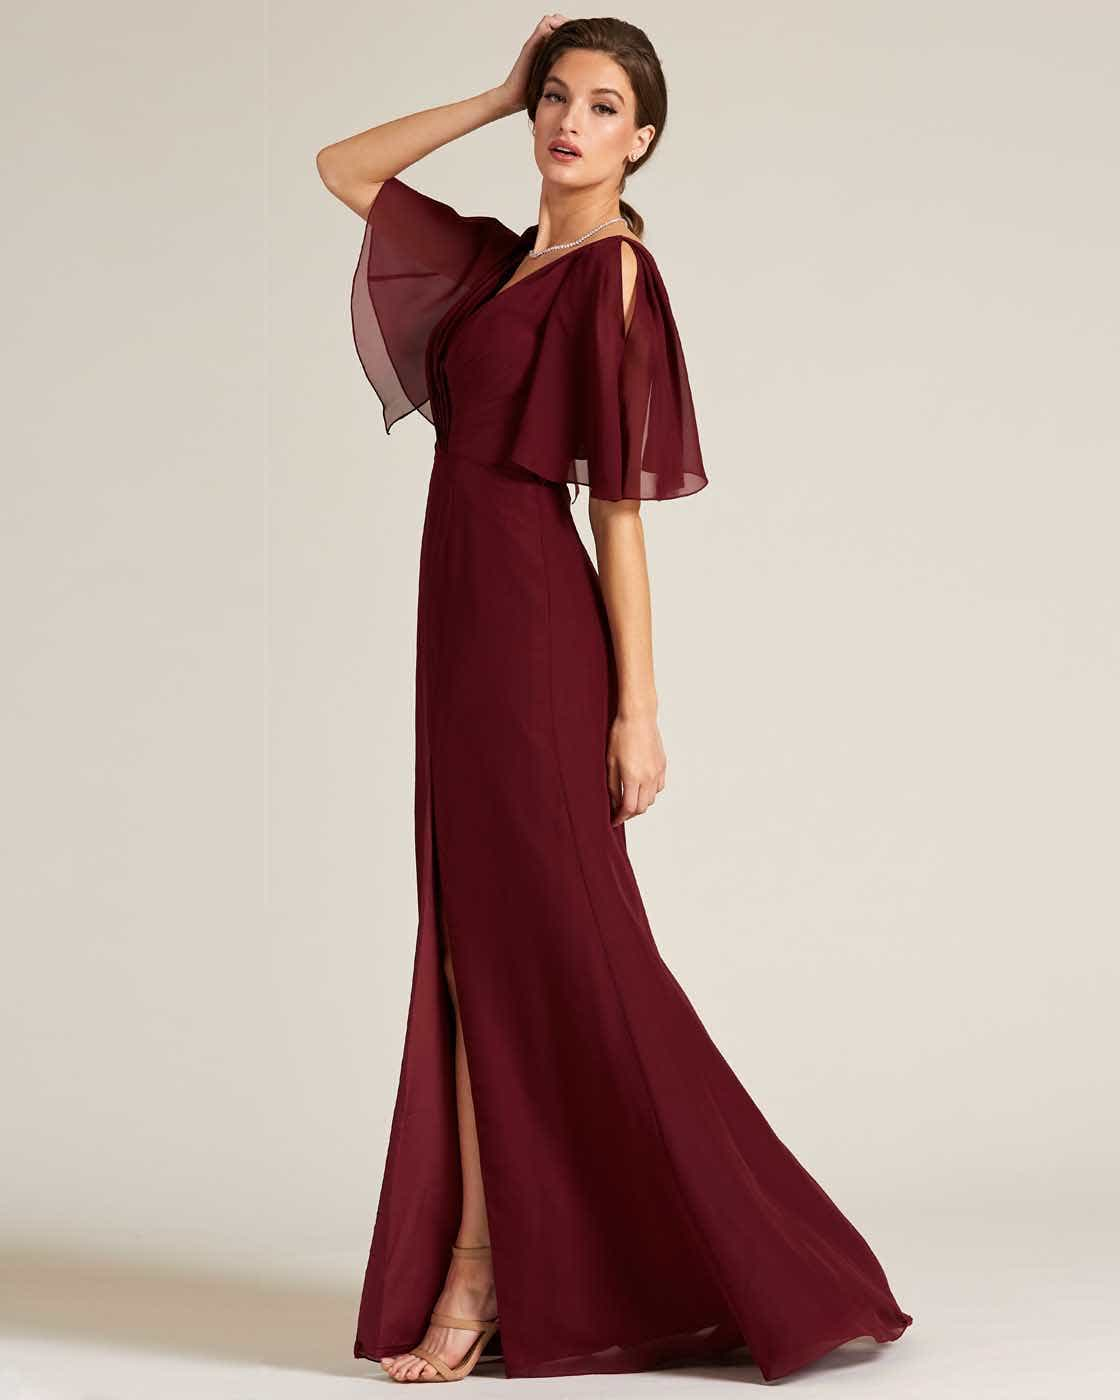 Burgundy Bell Cap Sleeve Gown - Side